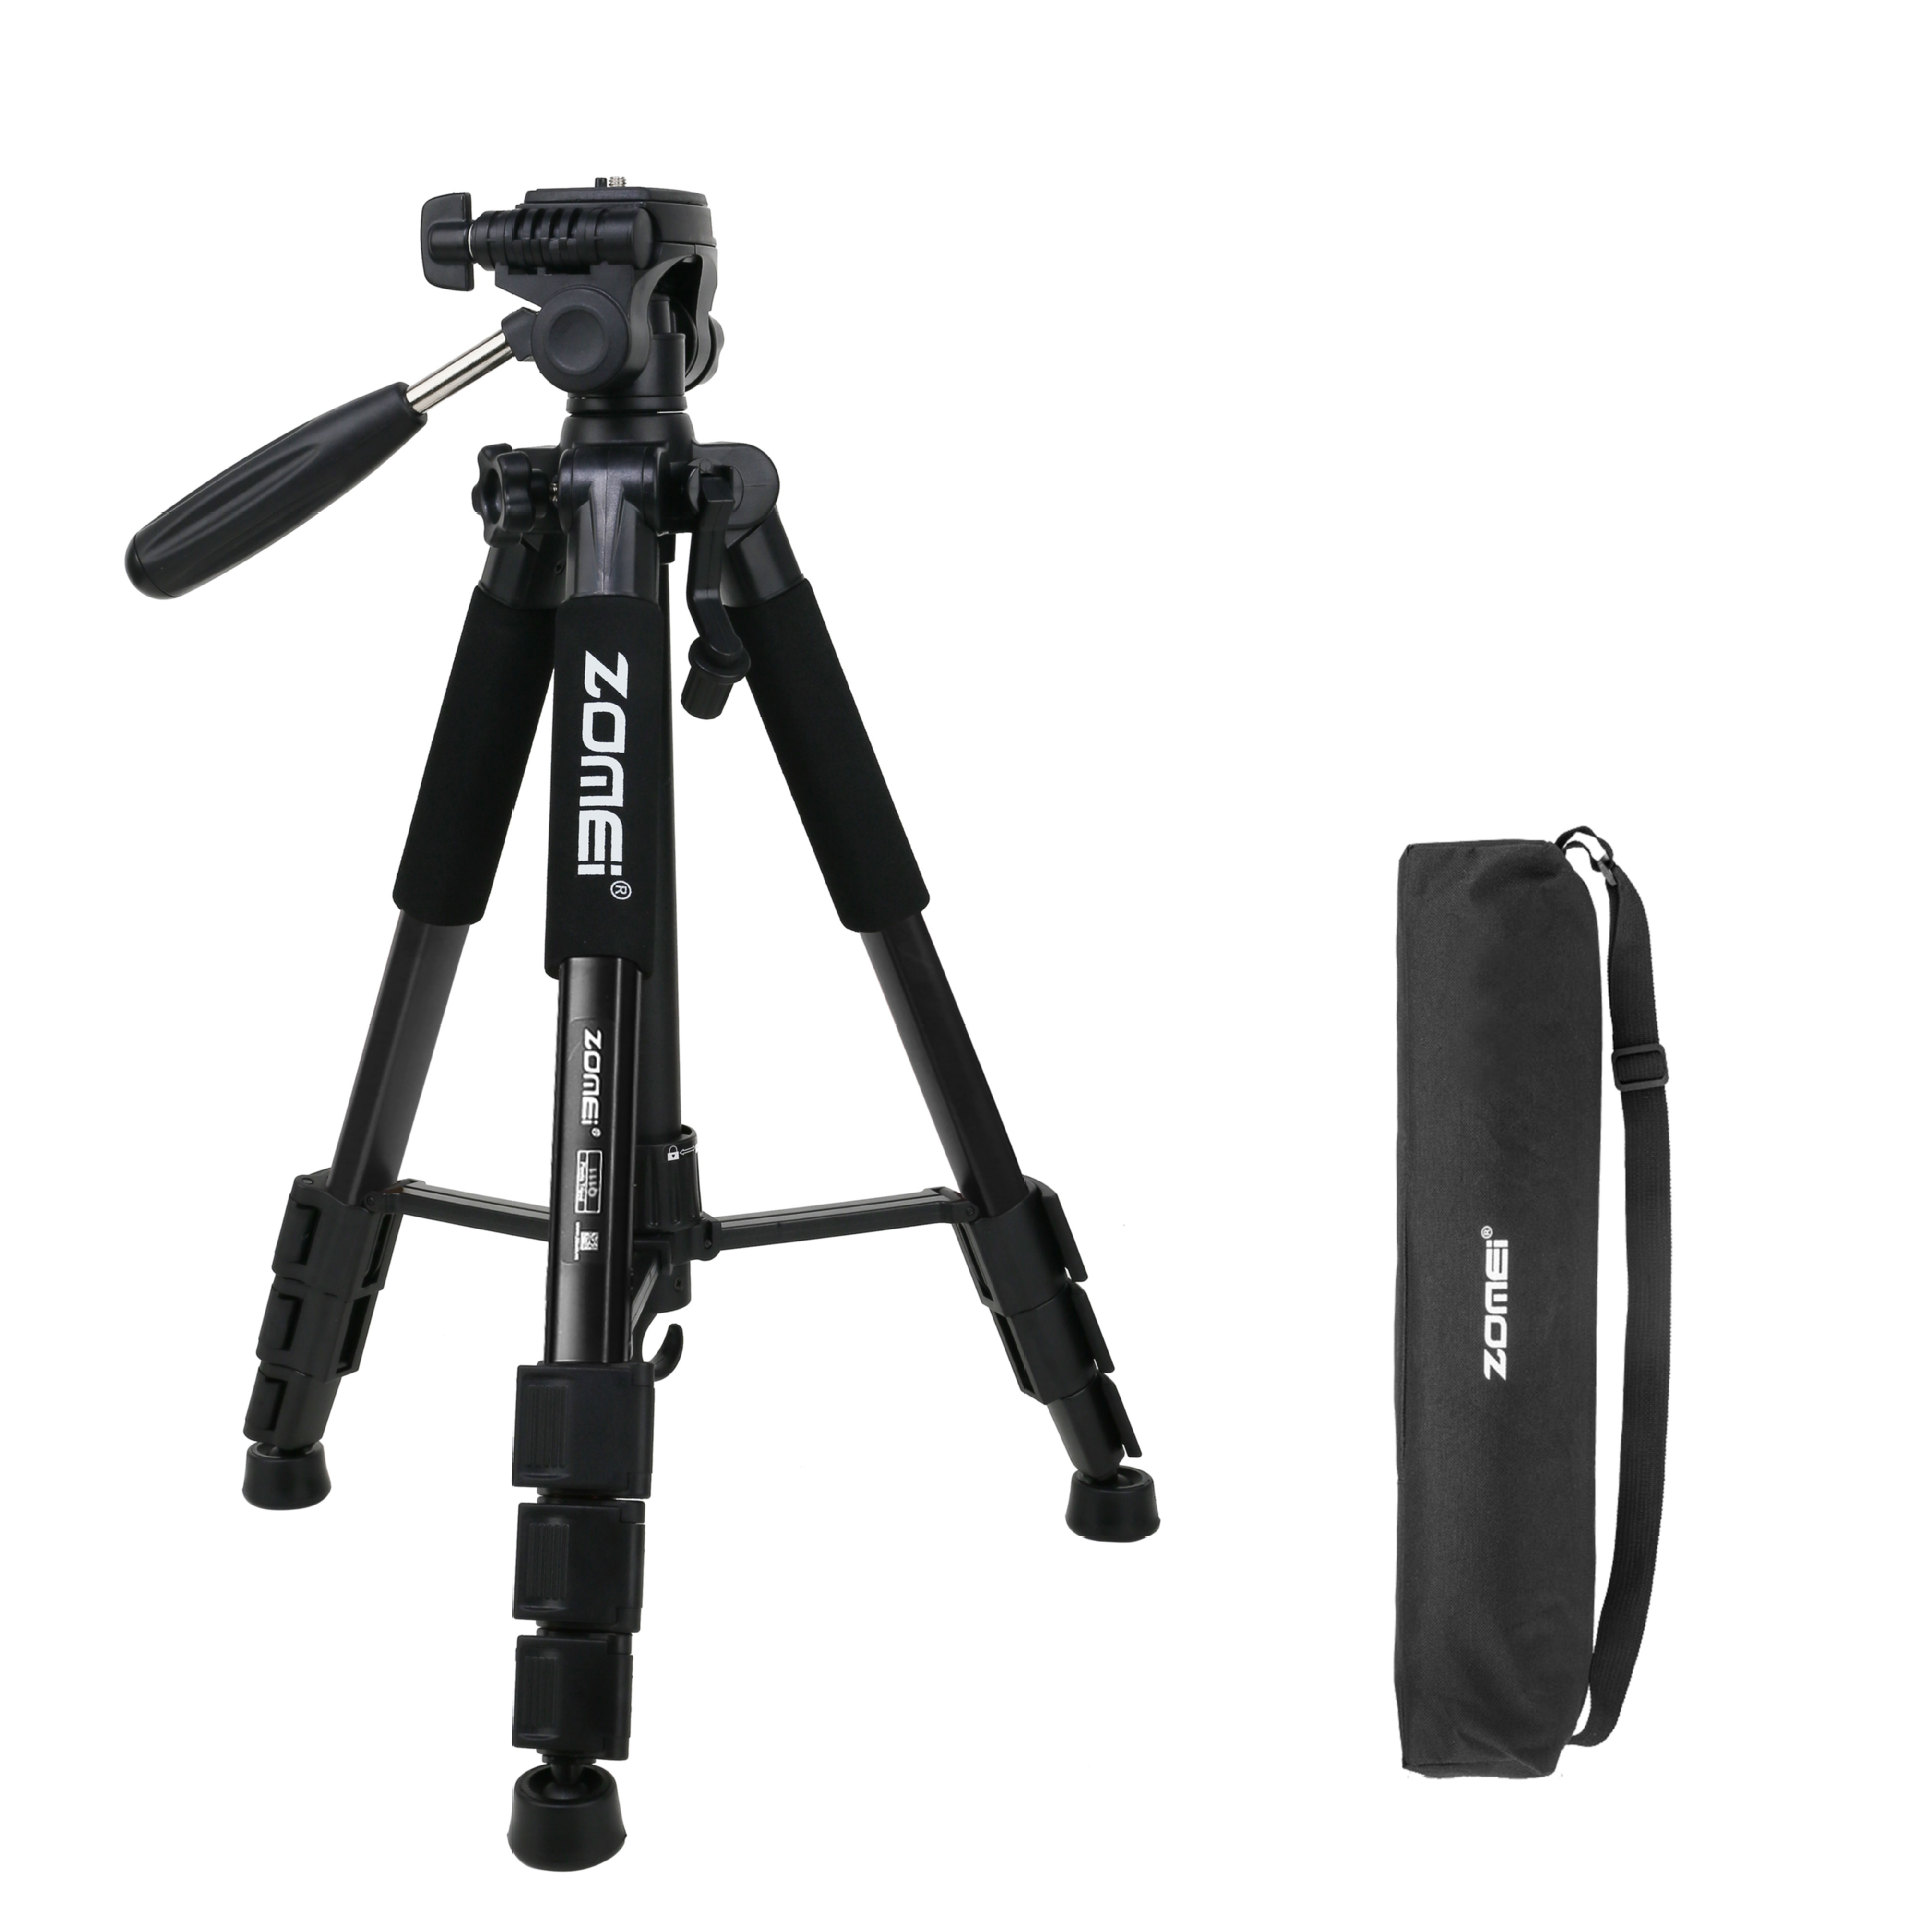 Mobile Phone Bracket Pro Aluminium Q111 Tripod for DSLR Camera Video Fill-in Light Bracket black